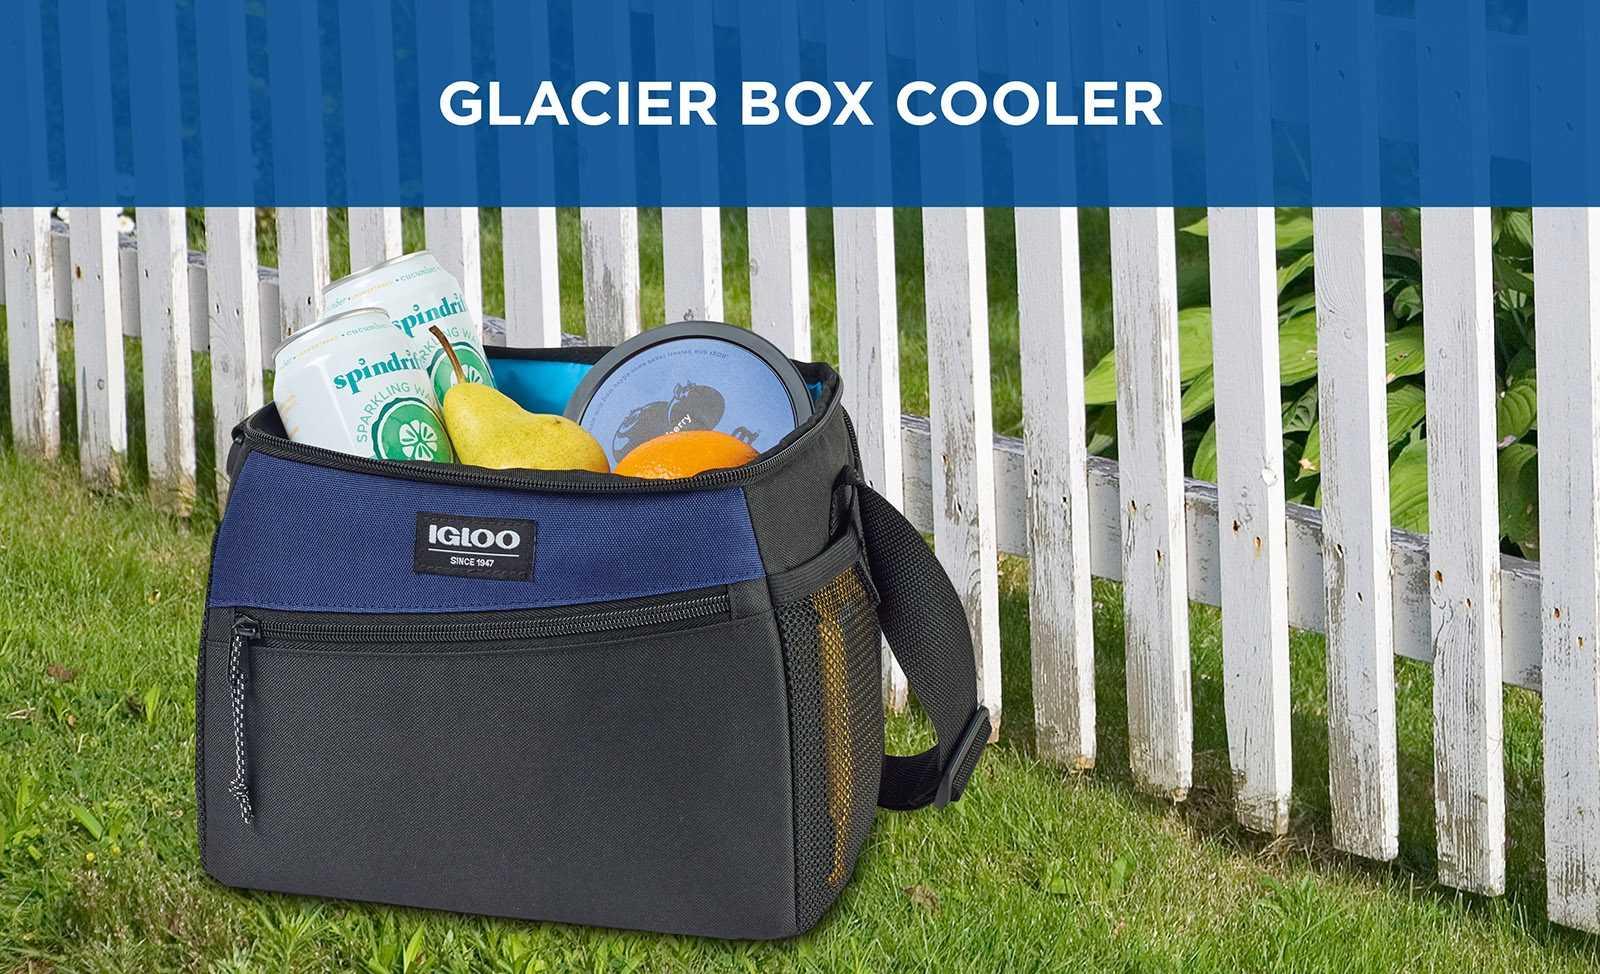 Glacier Box Cooler AIM